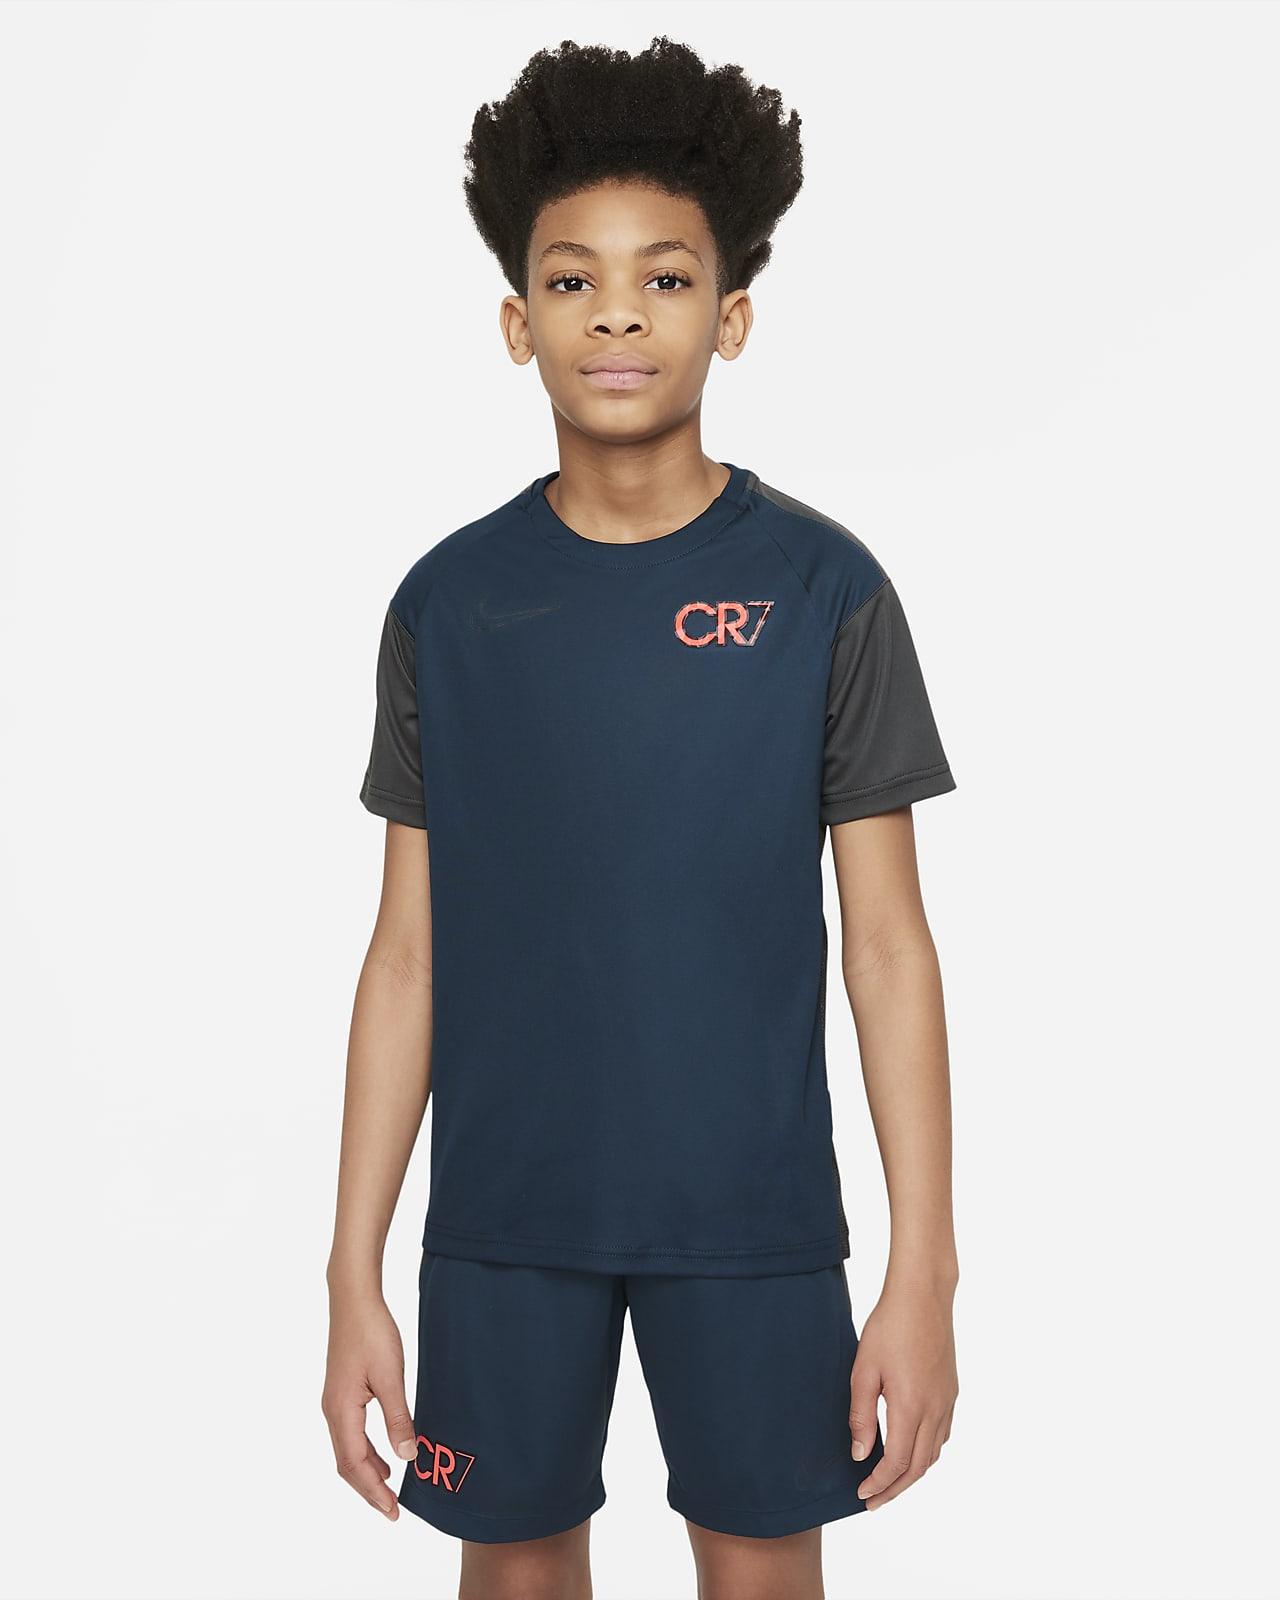 Nike Dri-FIT CR7 Older Kids' Short-Sleeve Football Top